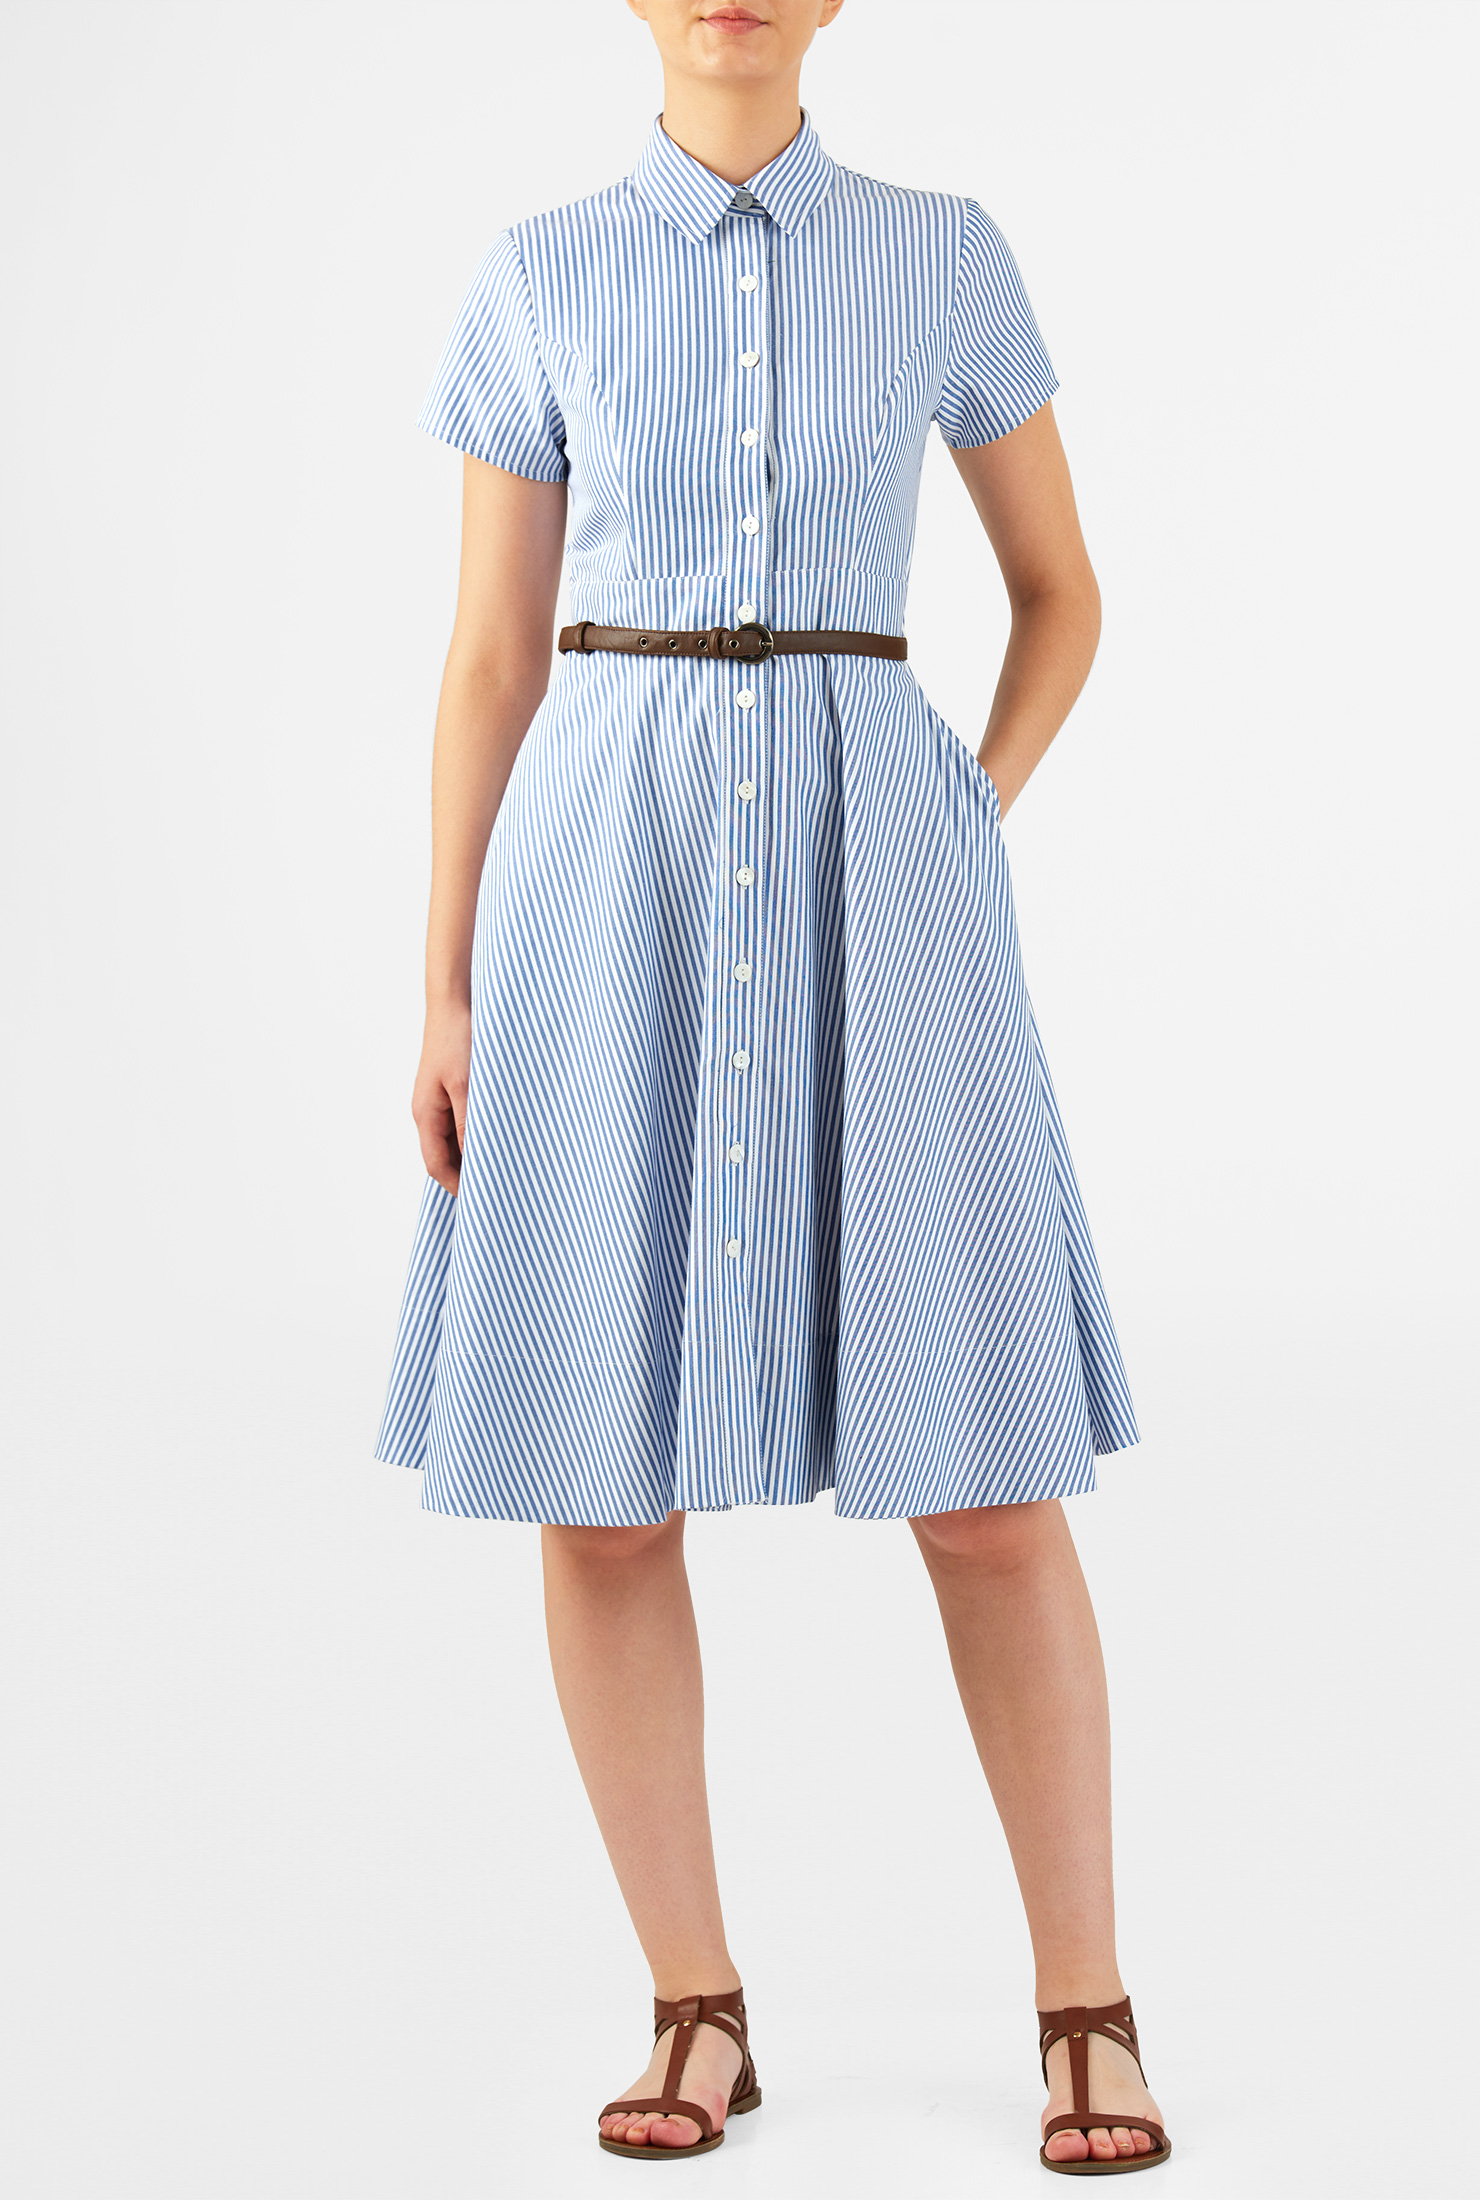 0175672e2289 Women s Fashion Clothing 0-36W and Custom